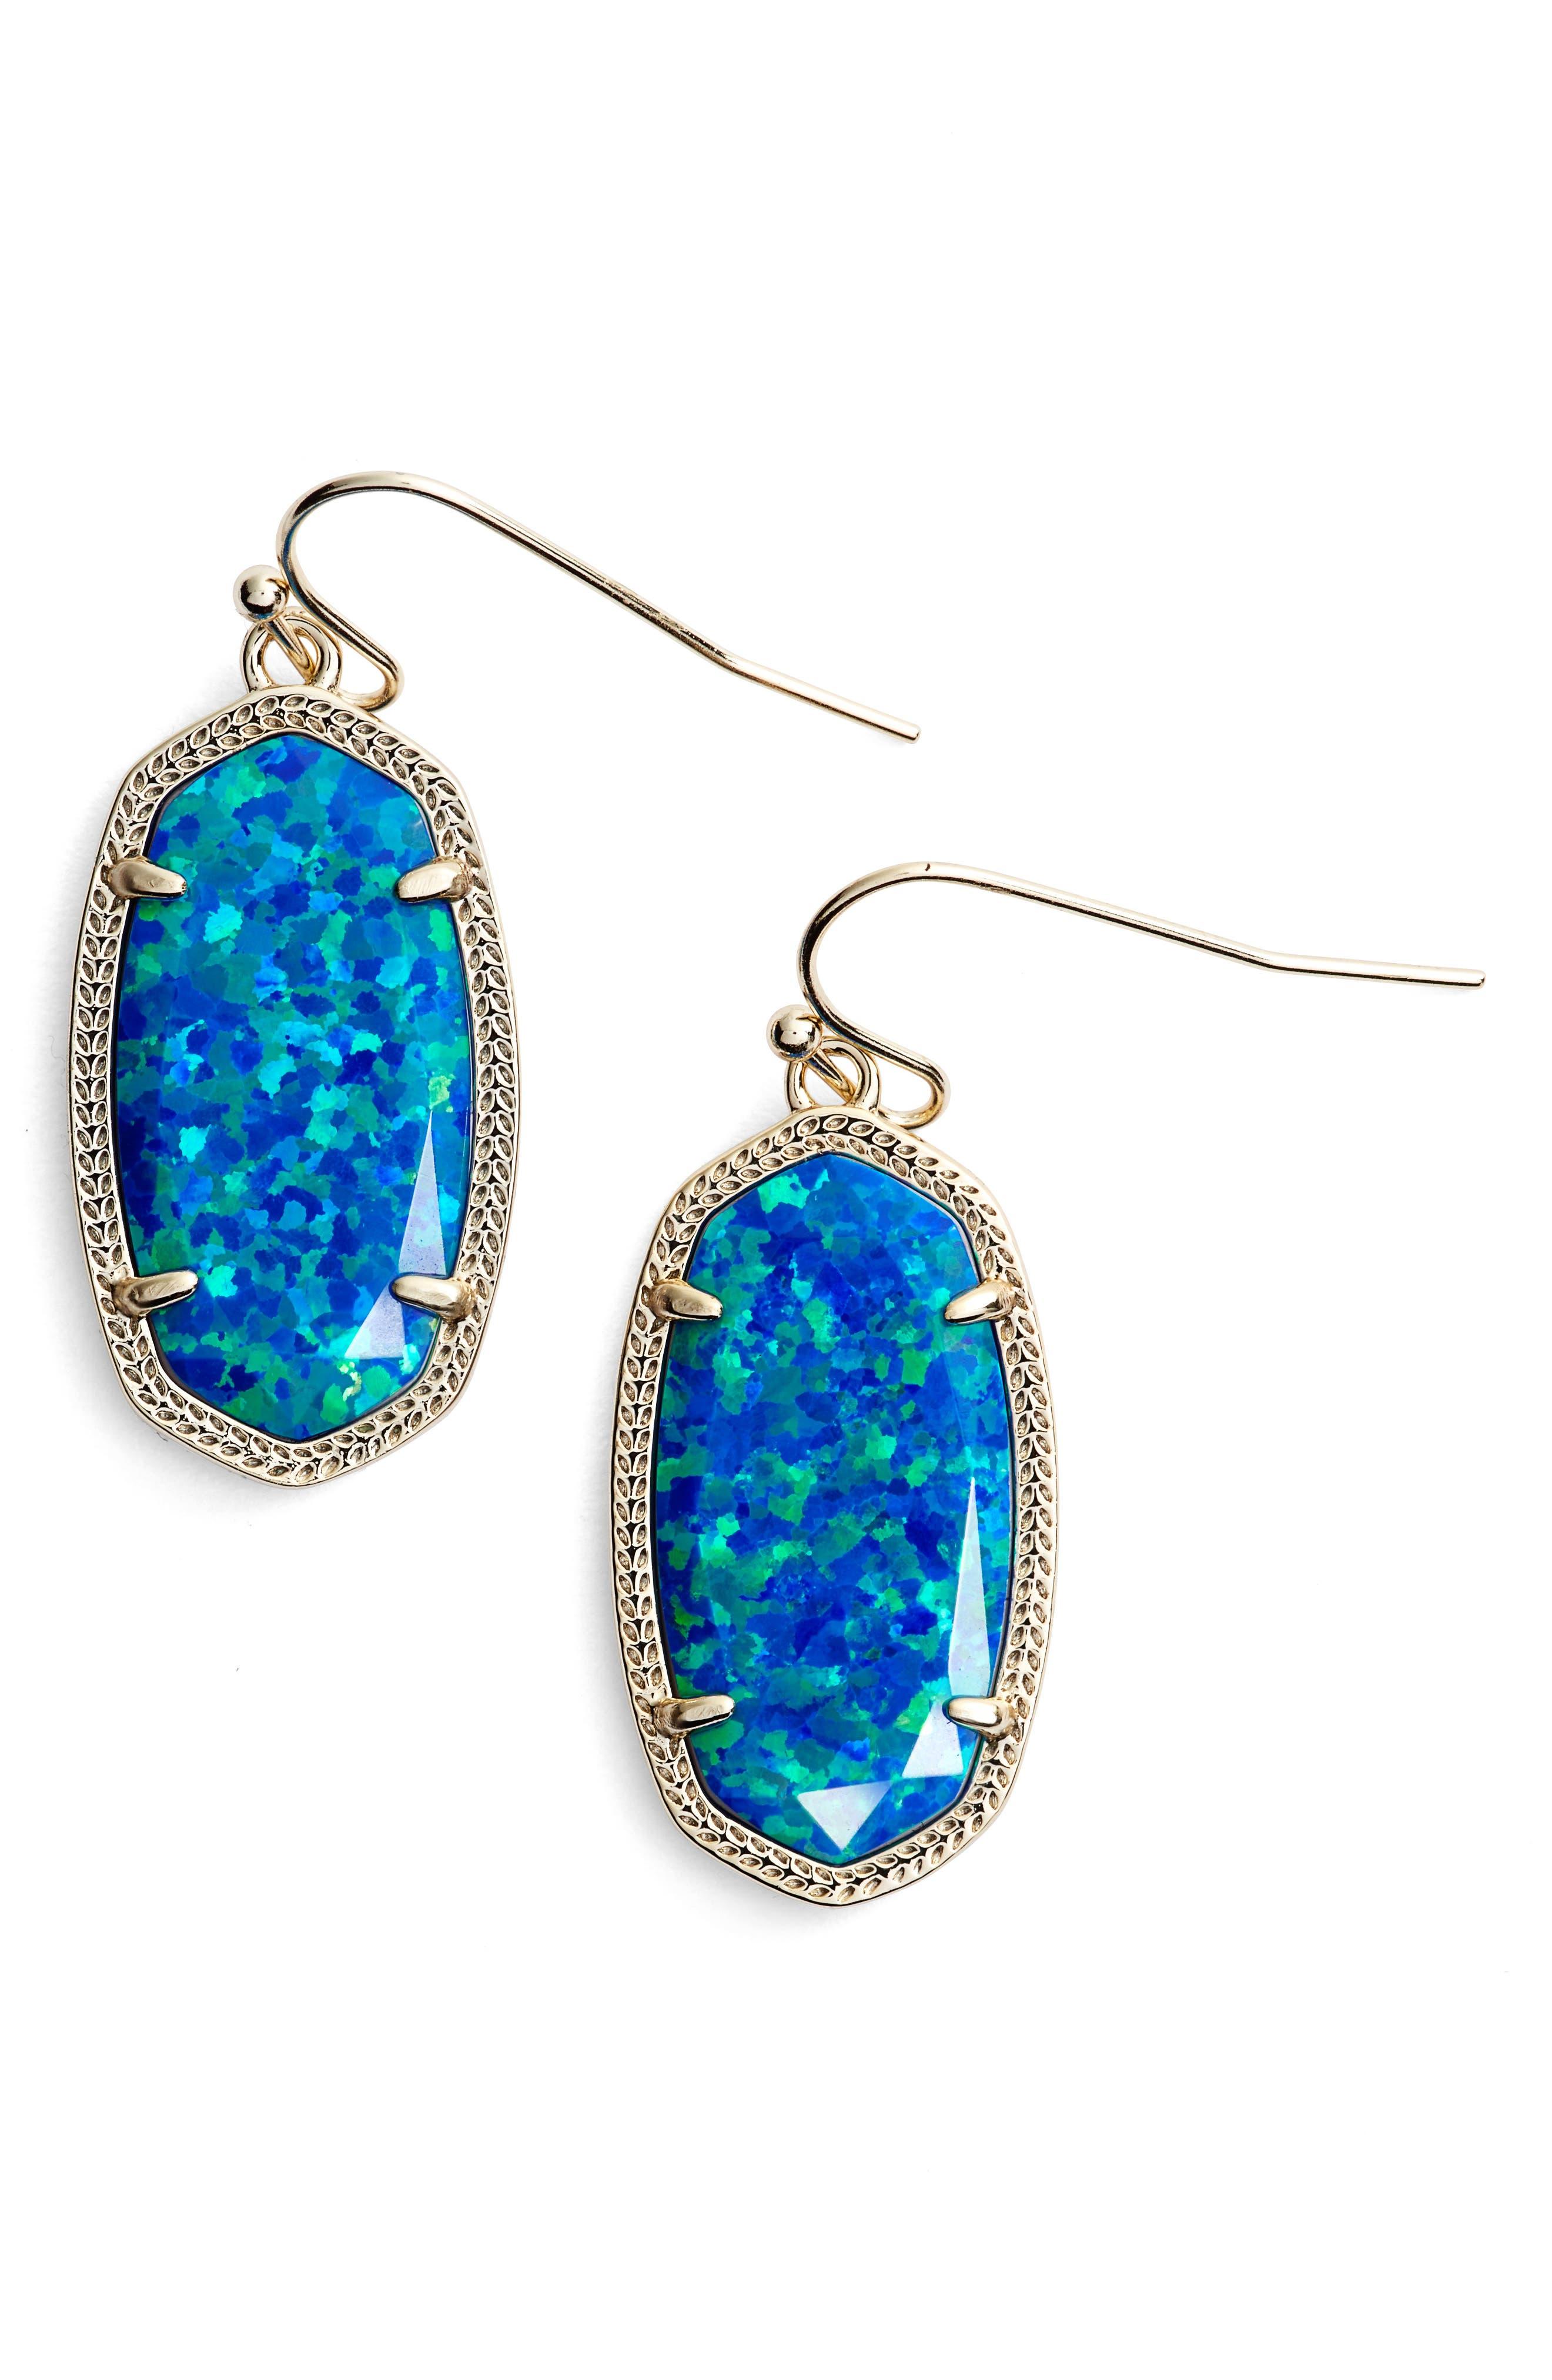 Dani Stone Drop Earrings,                             Main thumbnail 1, color,                             Royal Blue Kyocera Opal/ Gold